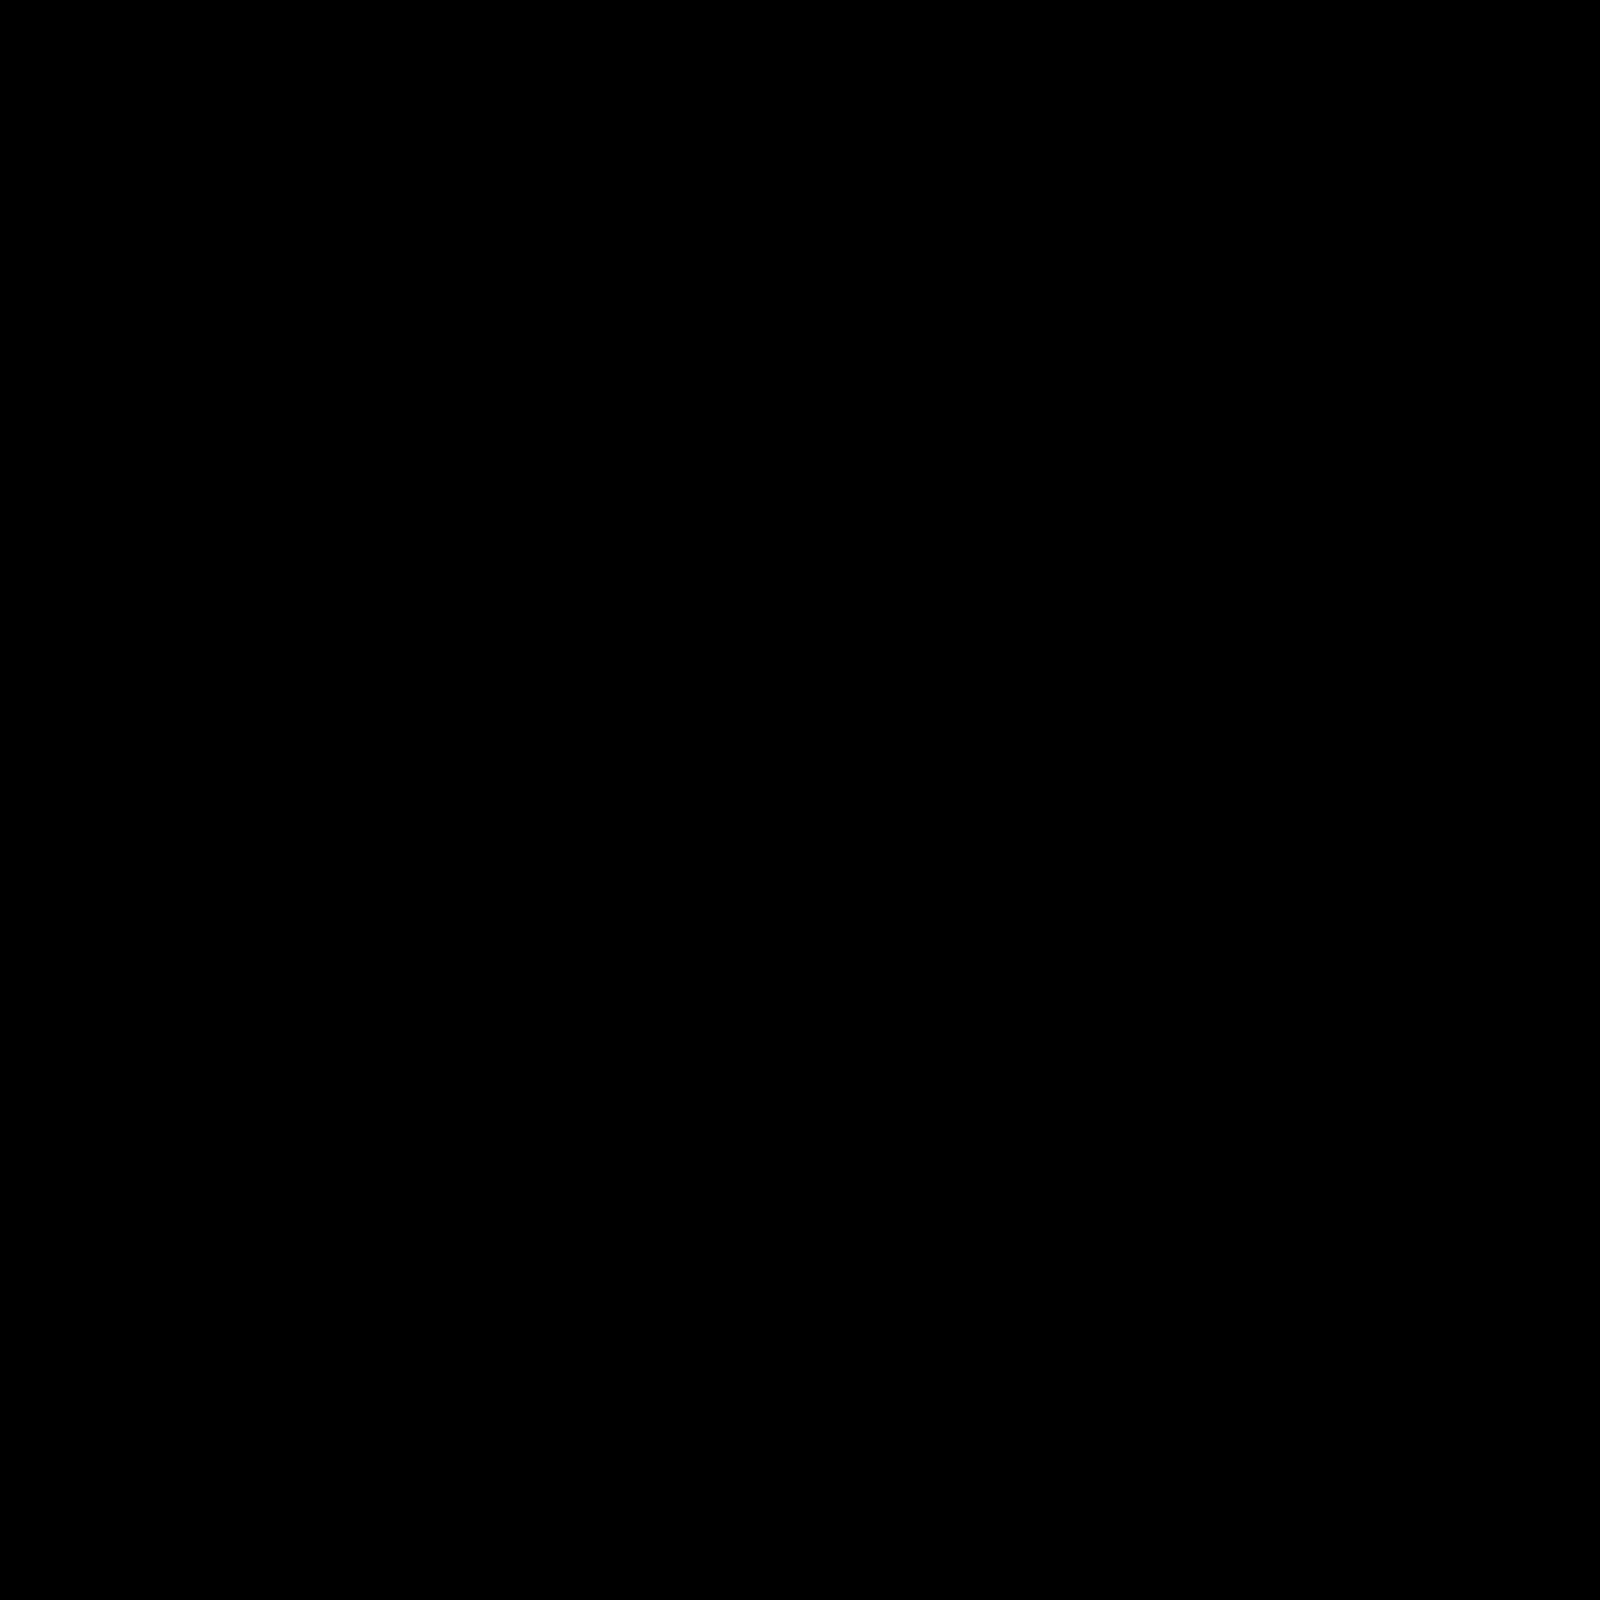 GPS Antenna Filled icon